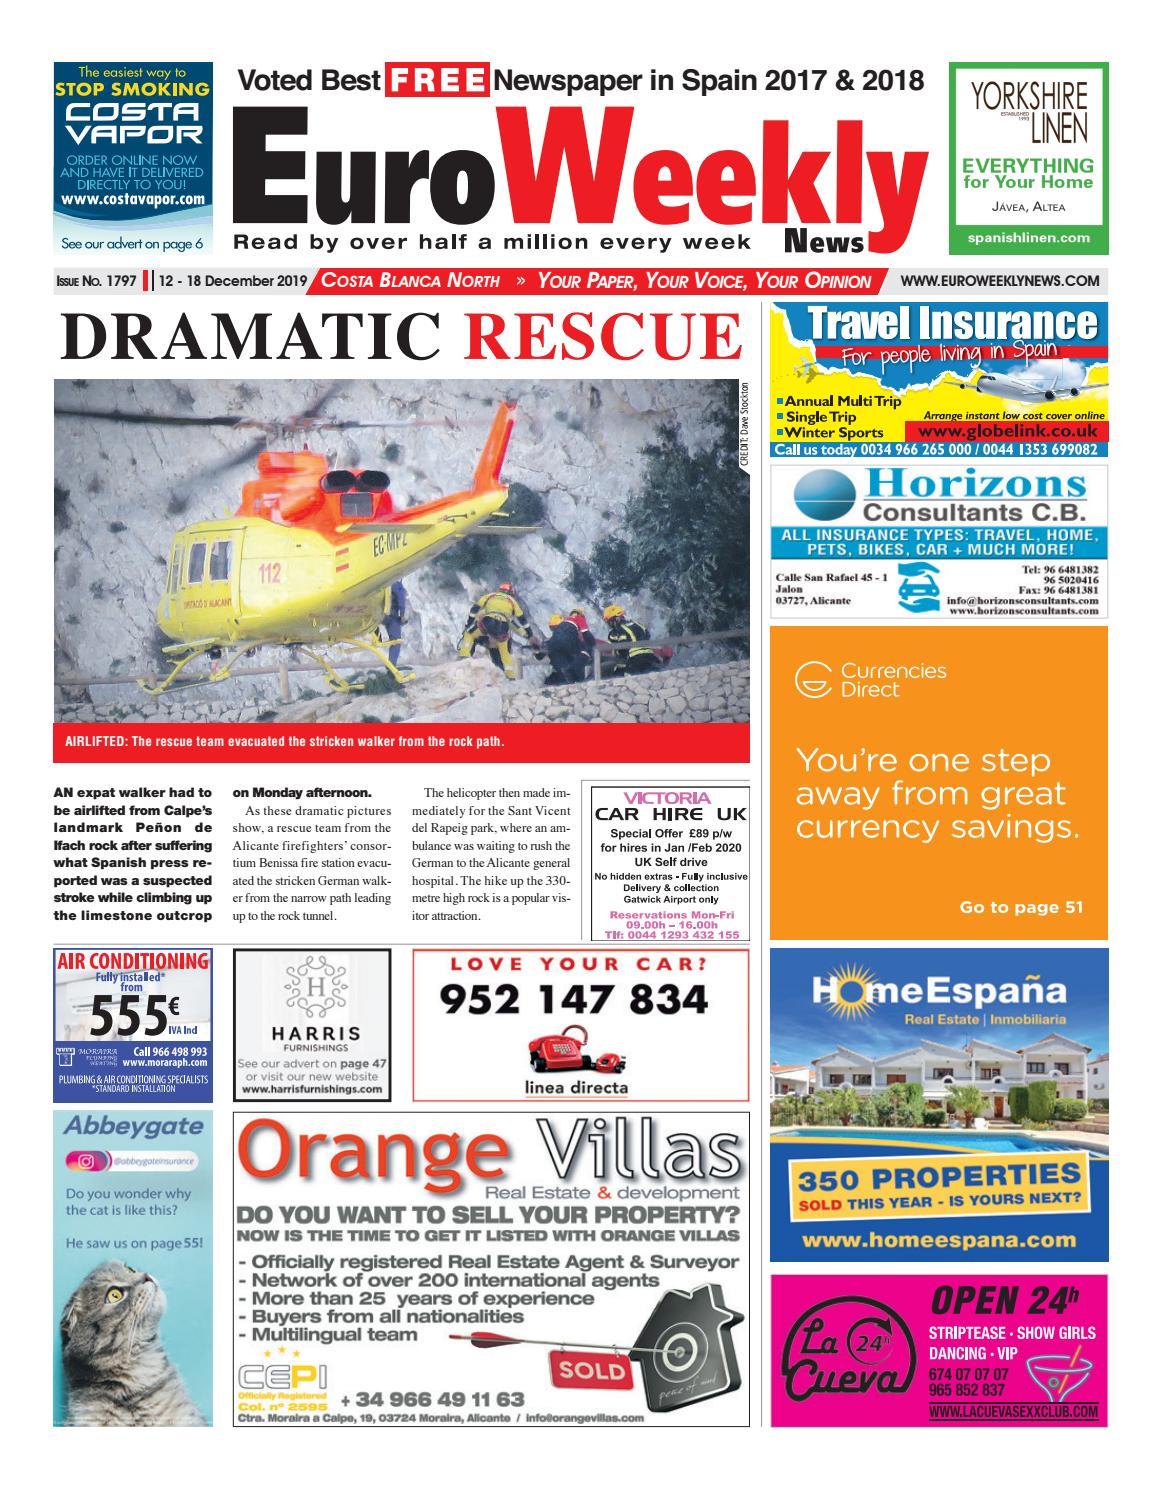 Euro Weekly News Costa Blanca North 12 18 December 2019 Issue